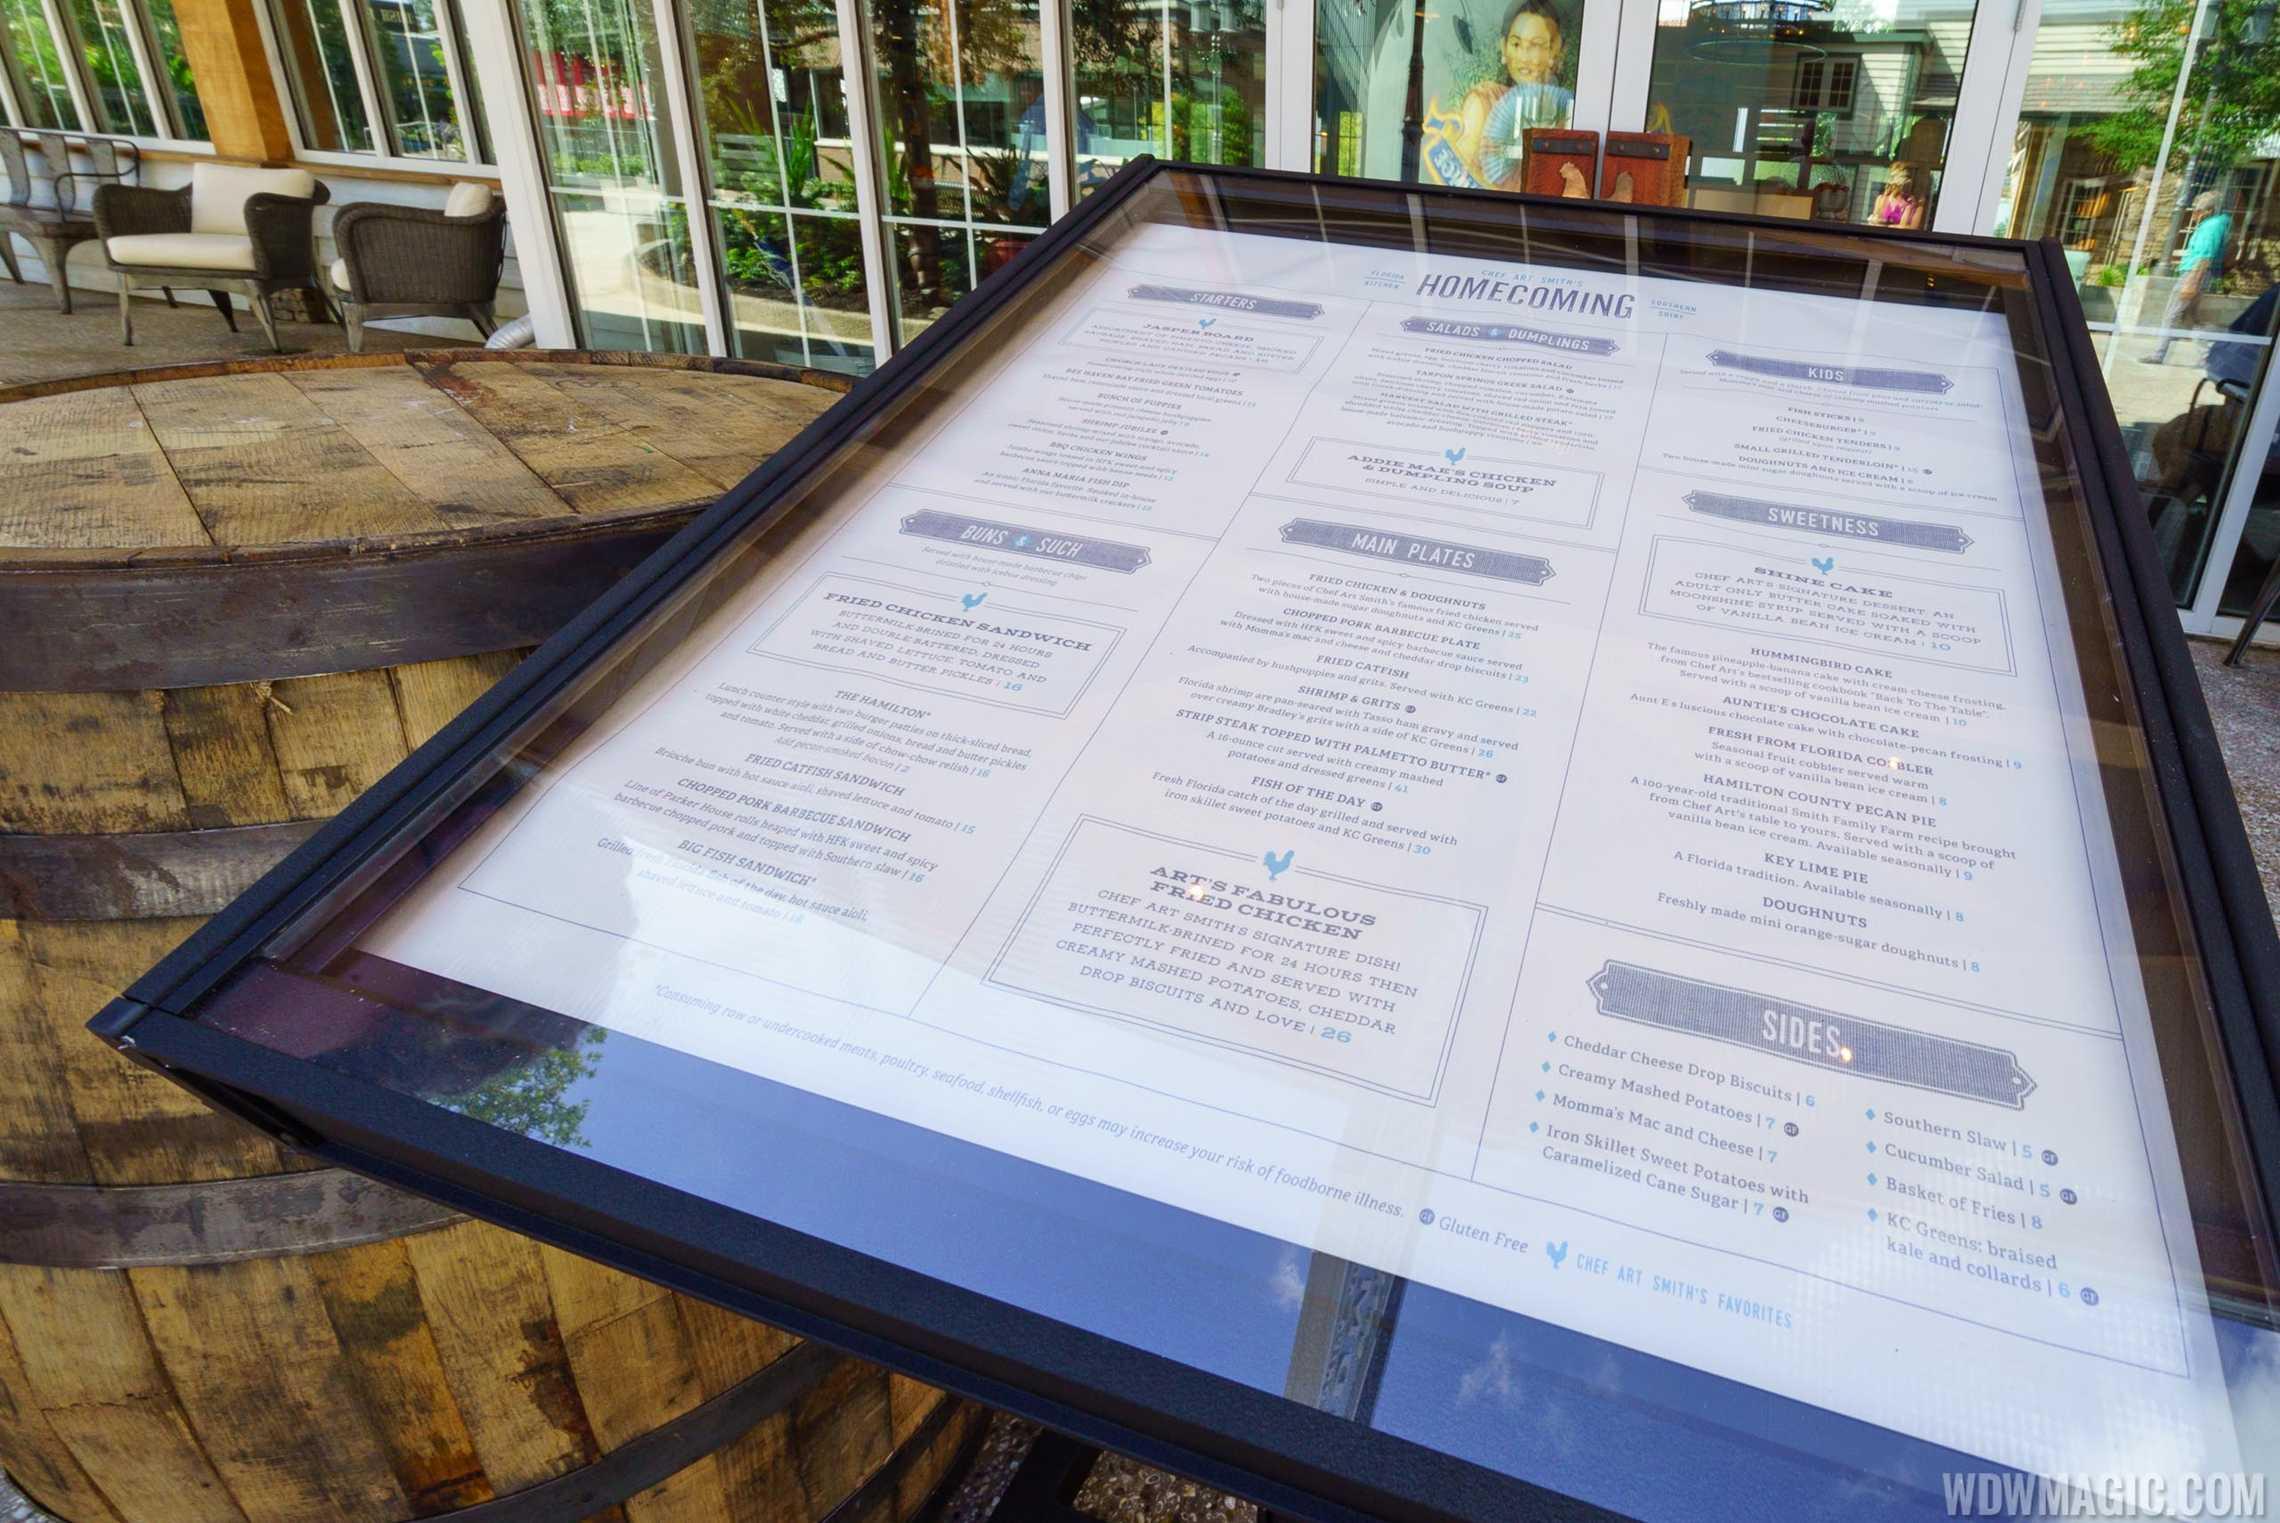 Homecoming restaurant - Menu board